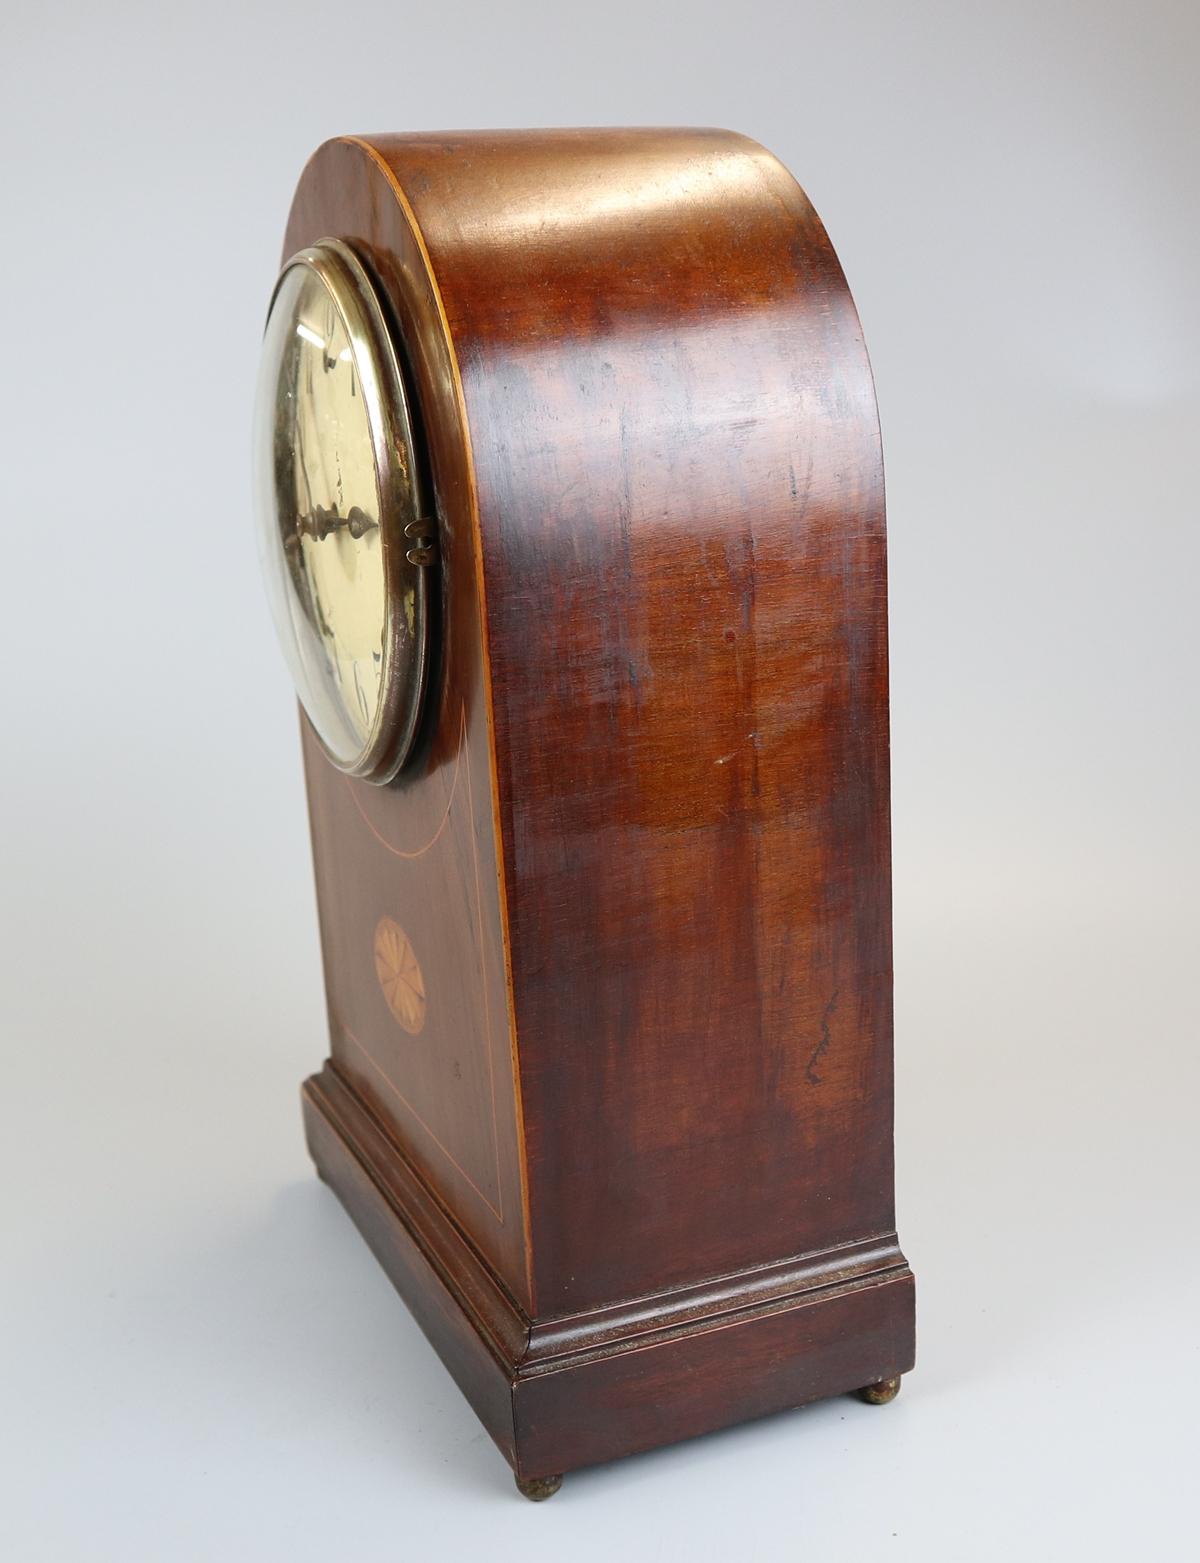 Inlaid mantle clock - Image 5 of 6